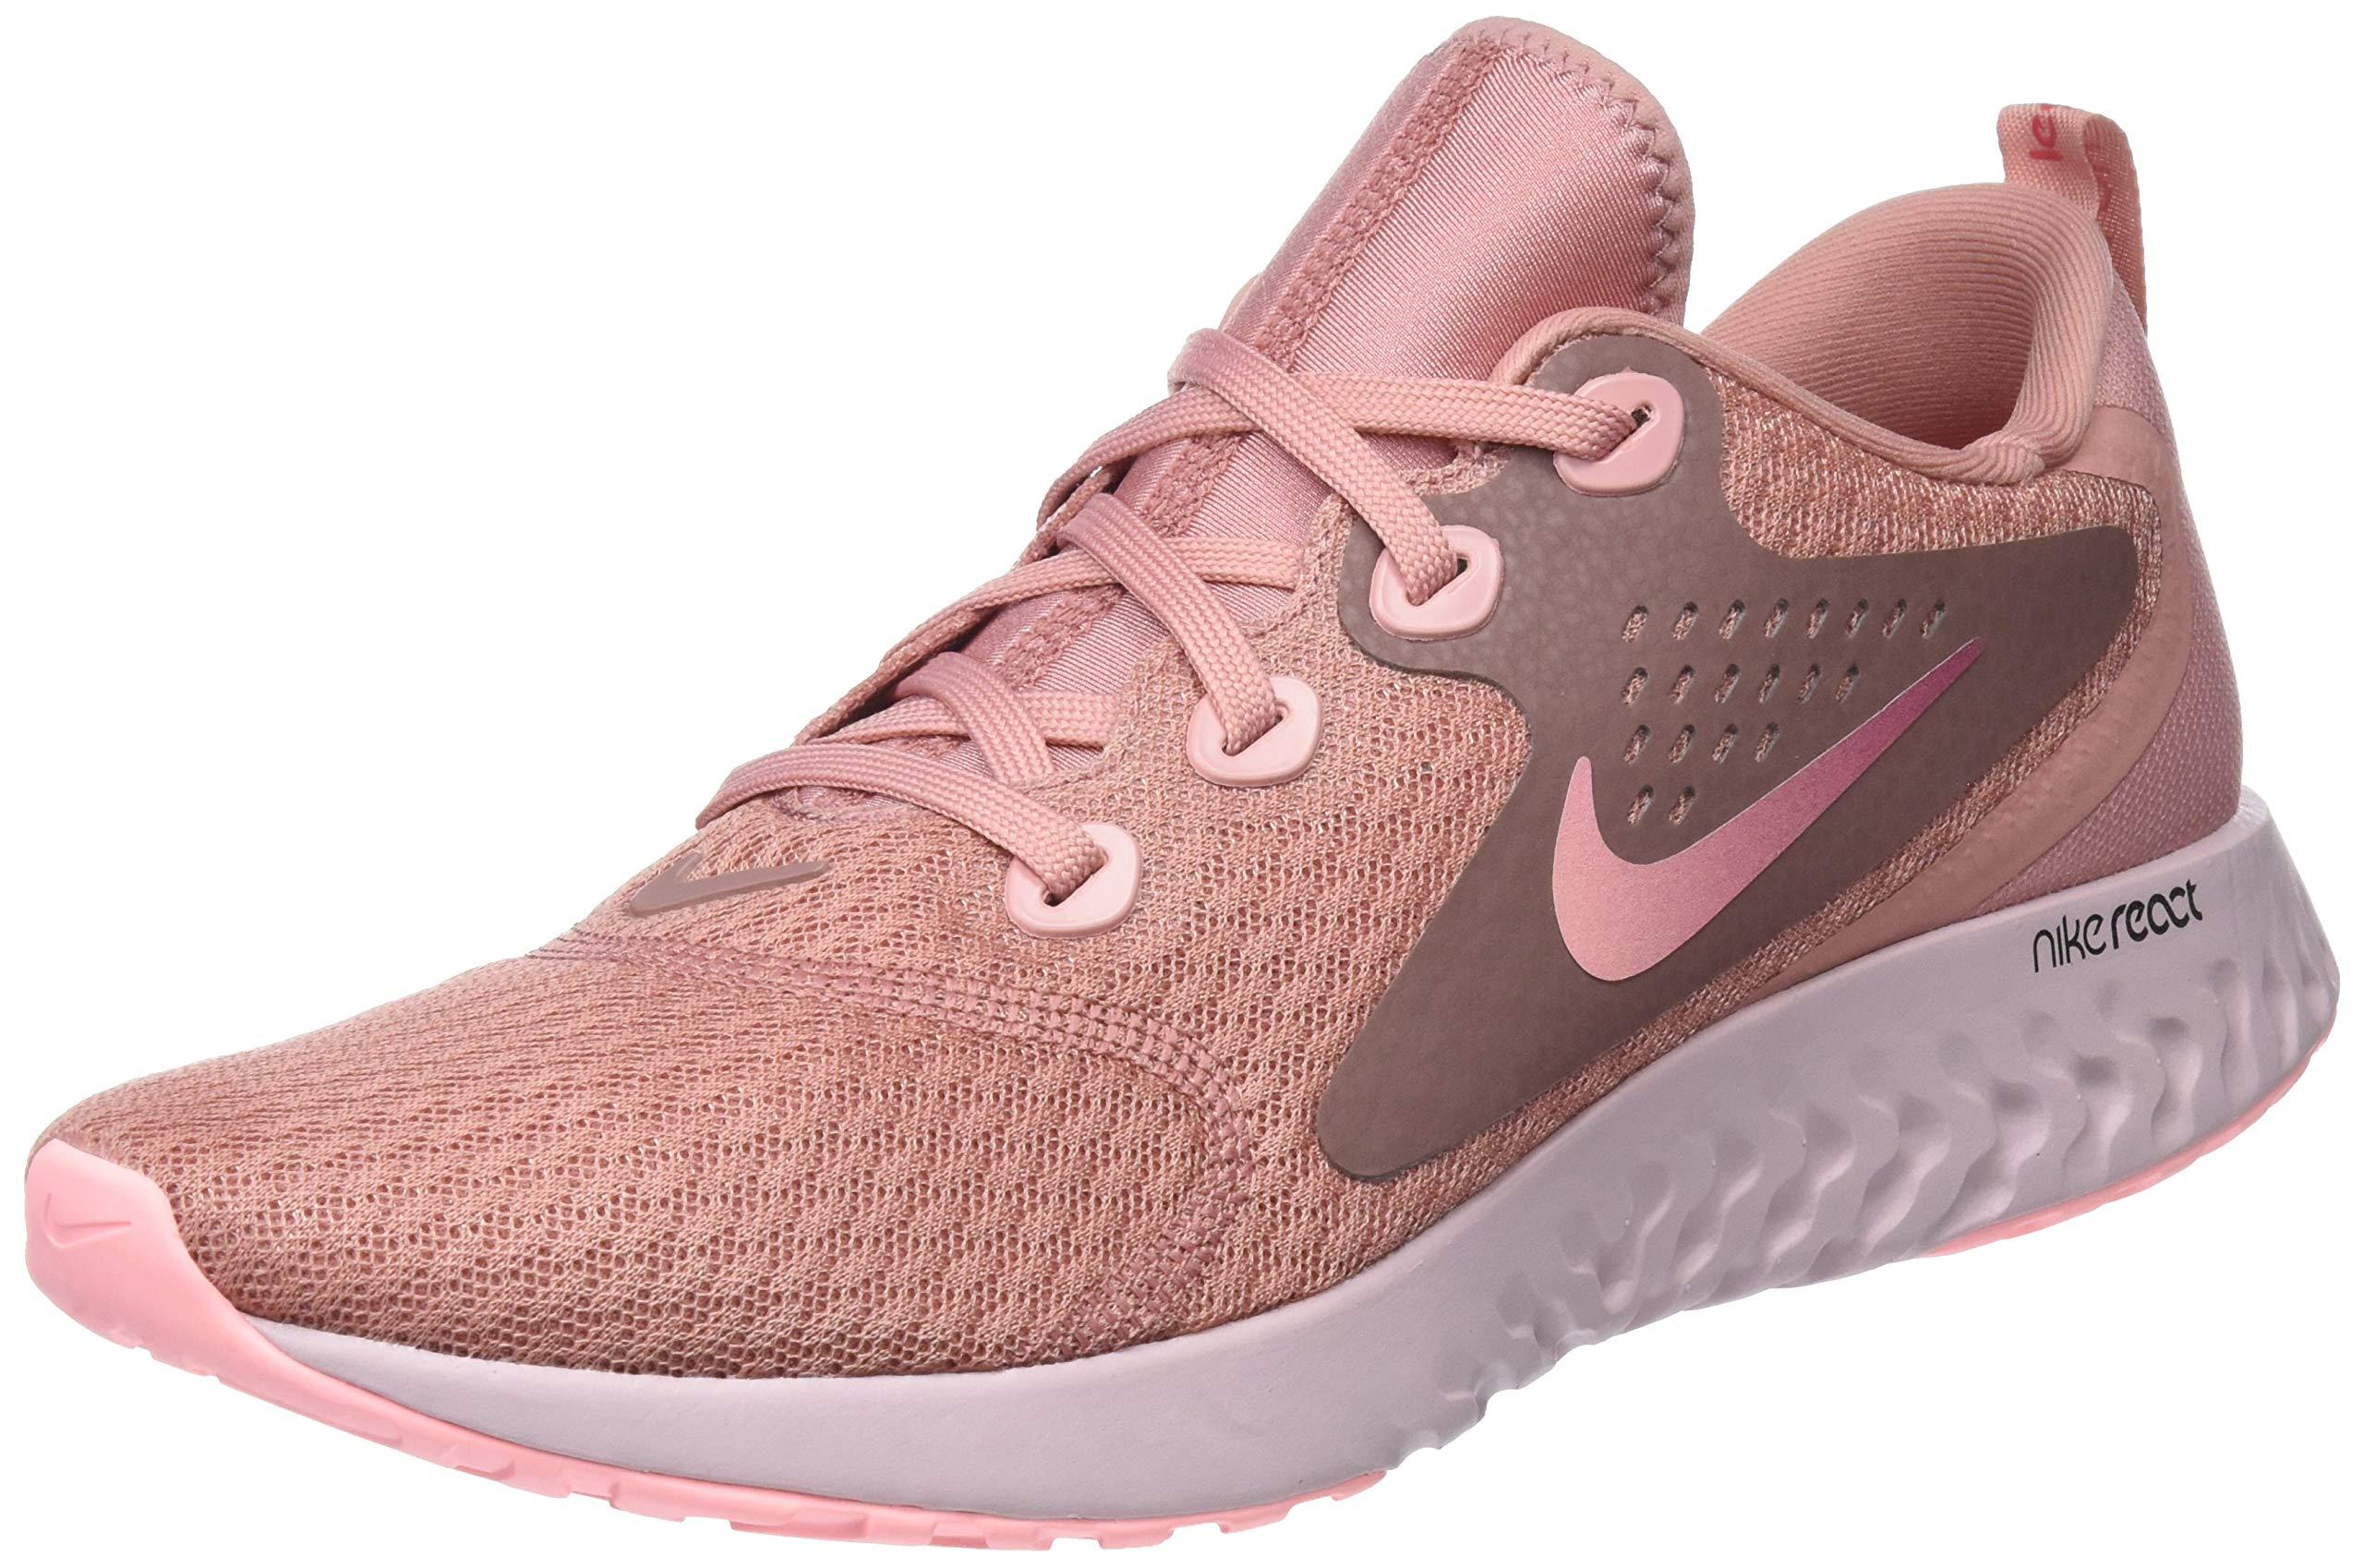 premium selection 32de2 a9f14 Galleon - Nike Women s Legend React Running Shoes (Rust Pink Tint Smokey  Mau 602), 6 UK